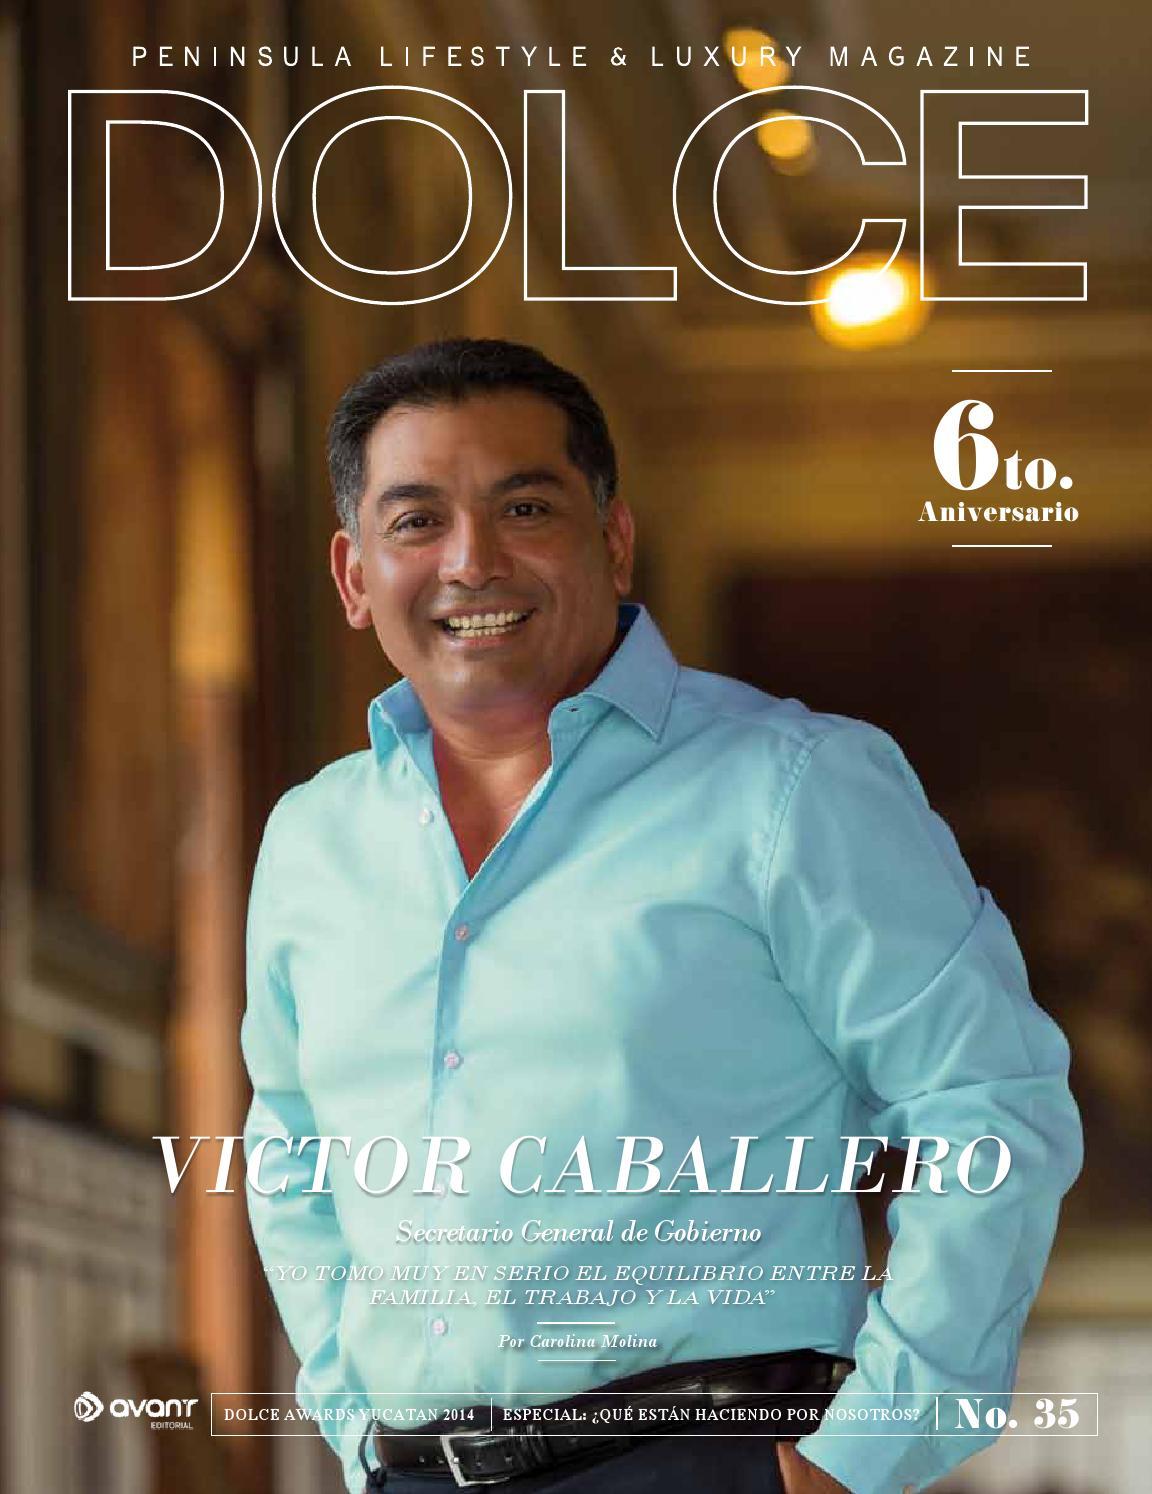 DOLCE magazine No.35 / 2014 \